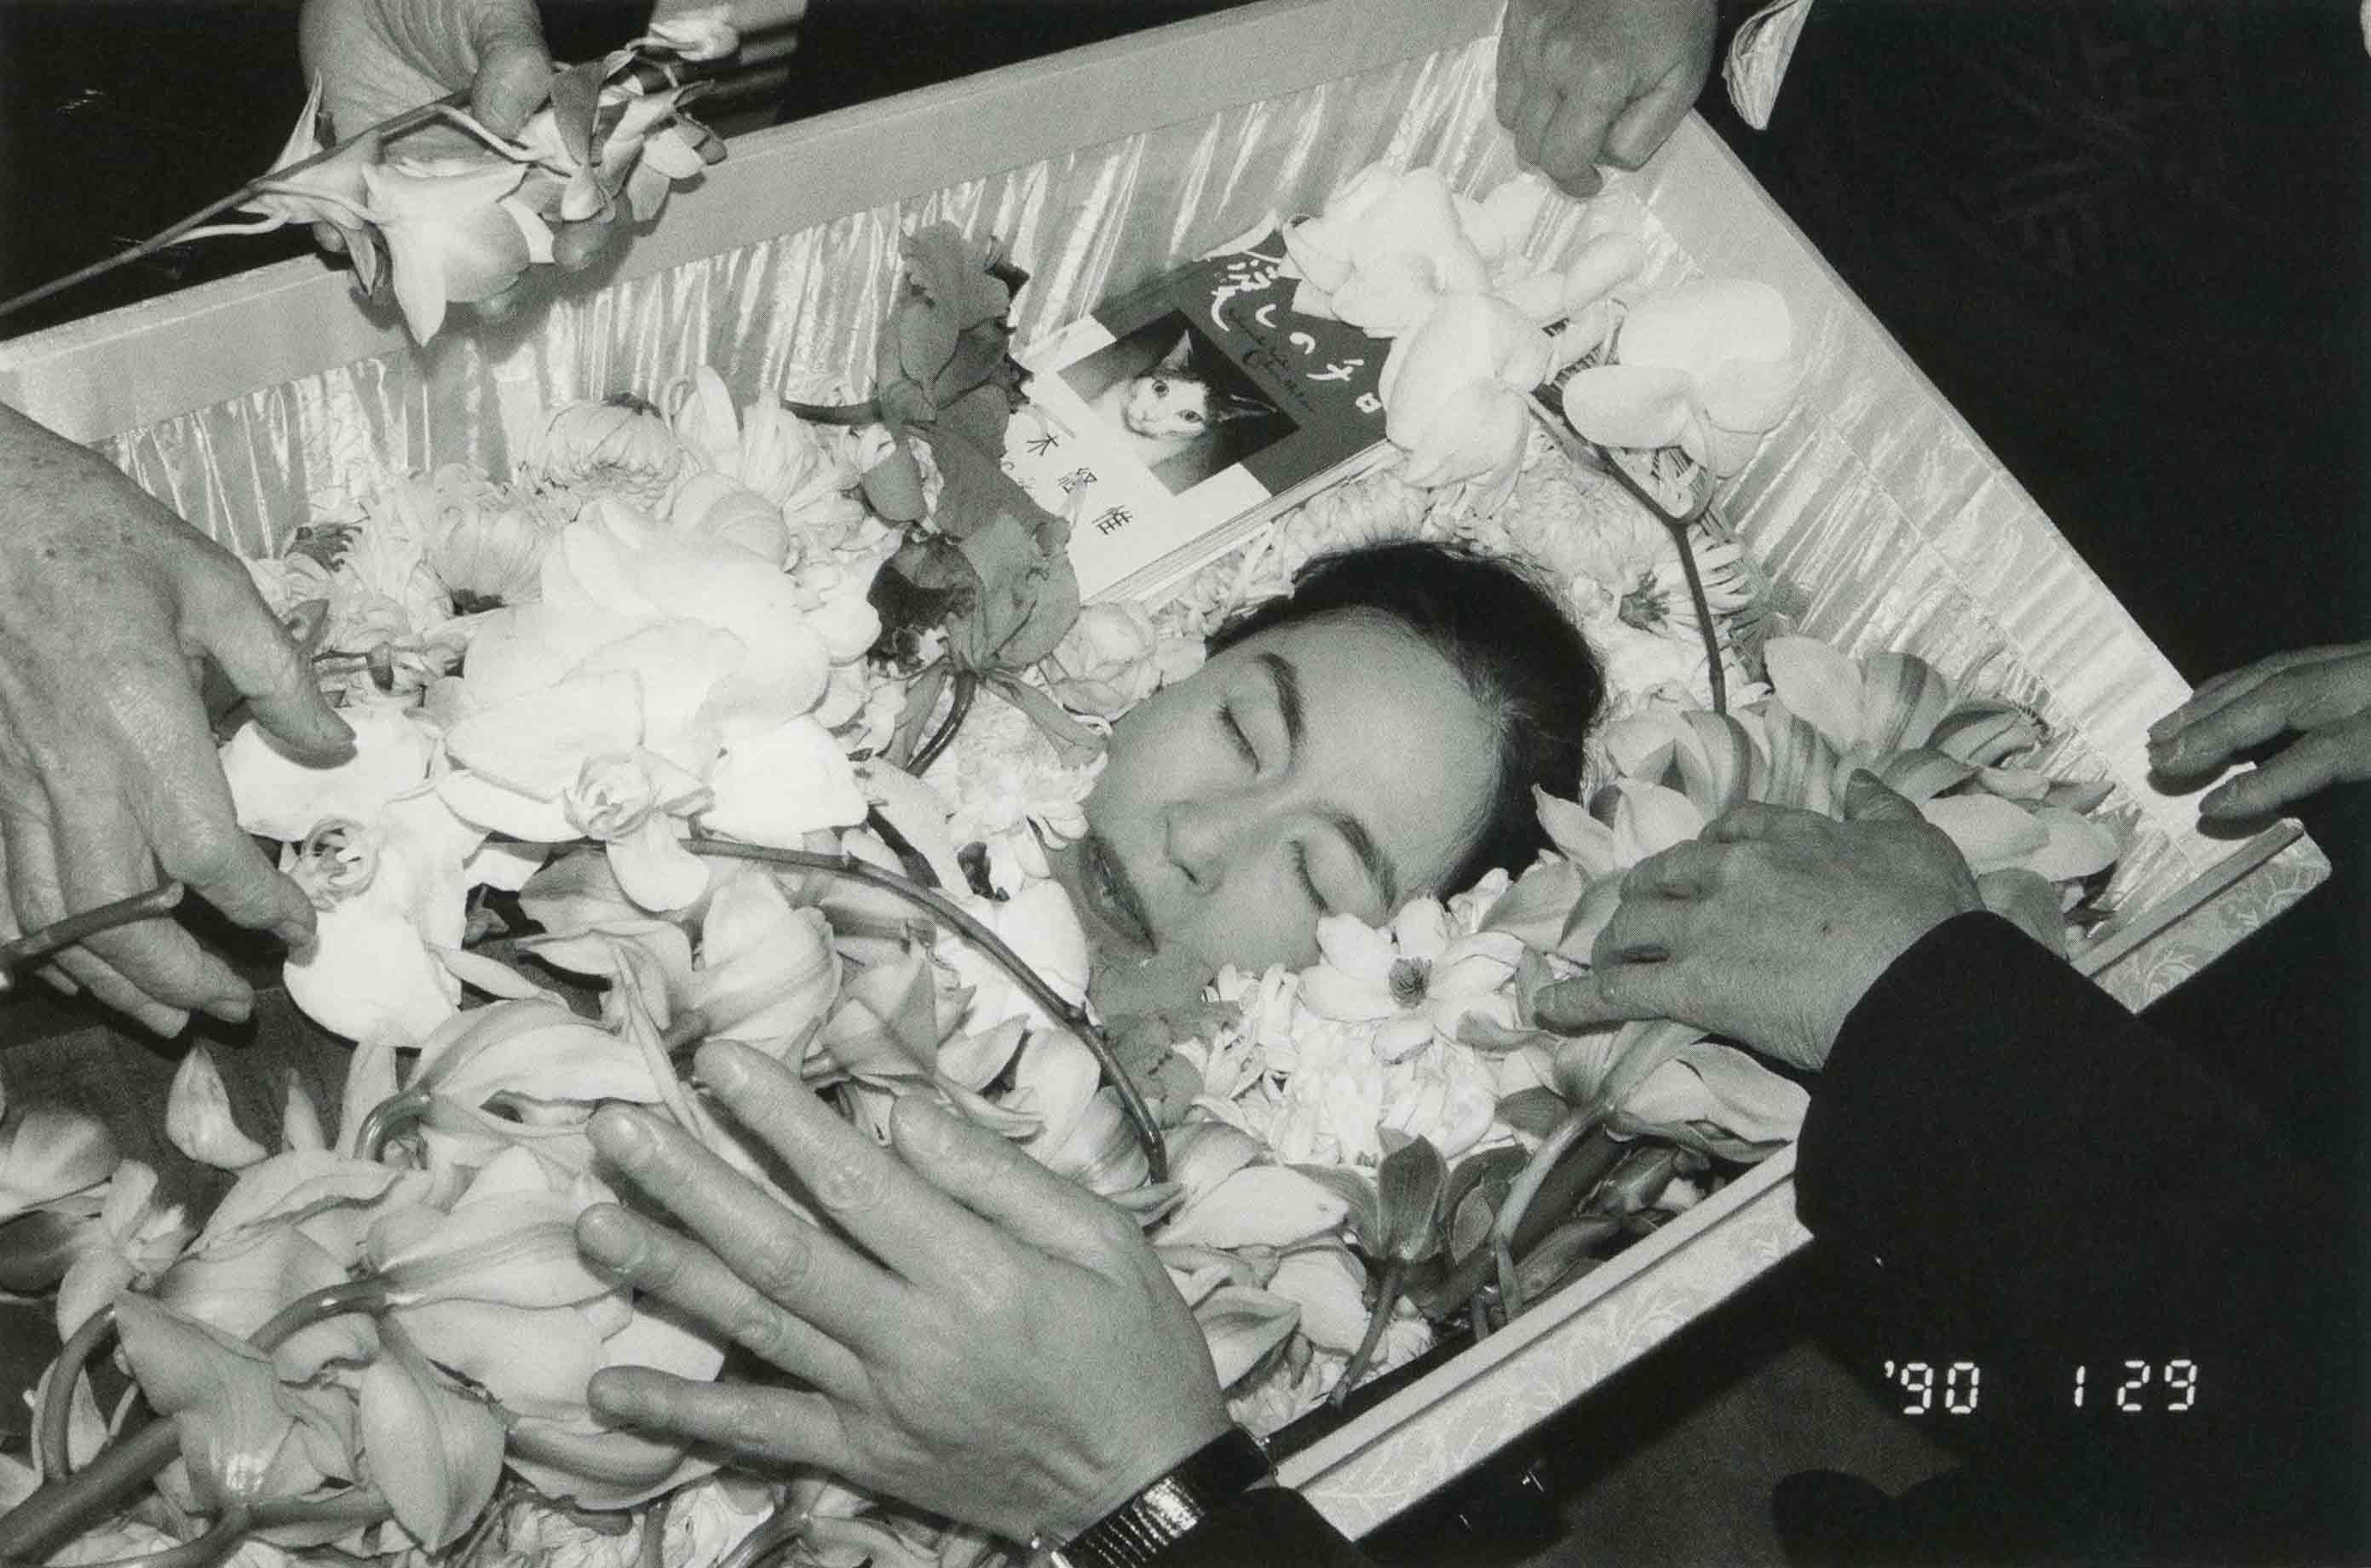 Nobuyoshi Araki, Winter Journey, 1989-90, 2005, Courtesy of Taka Ishii Gallery, Tokyo